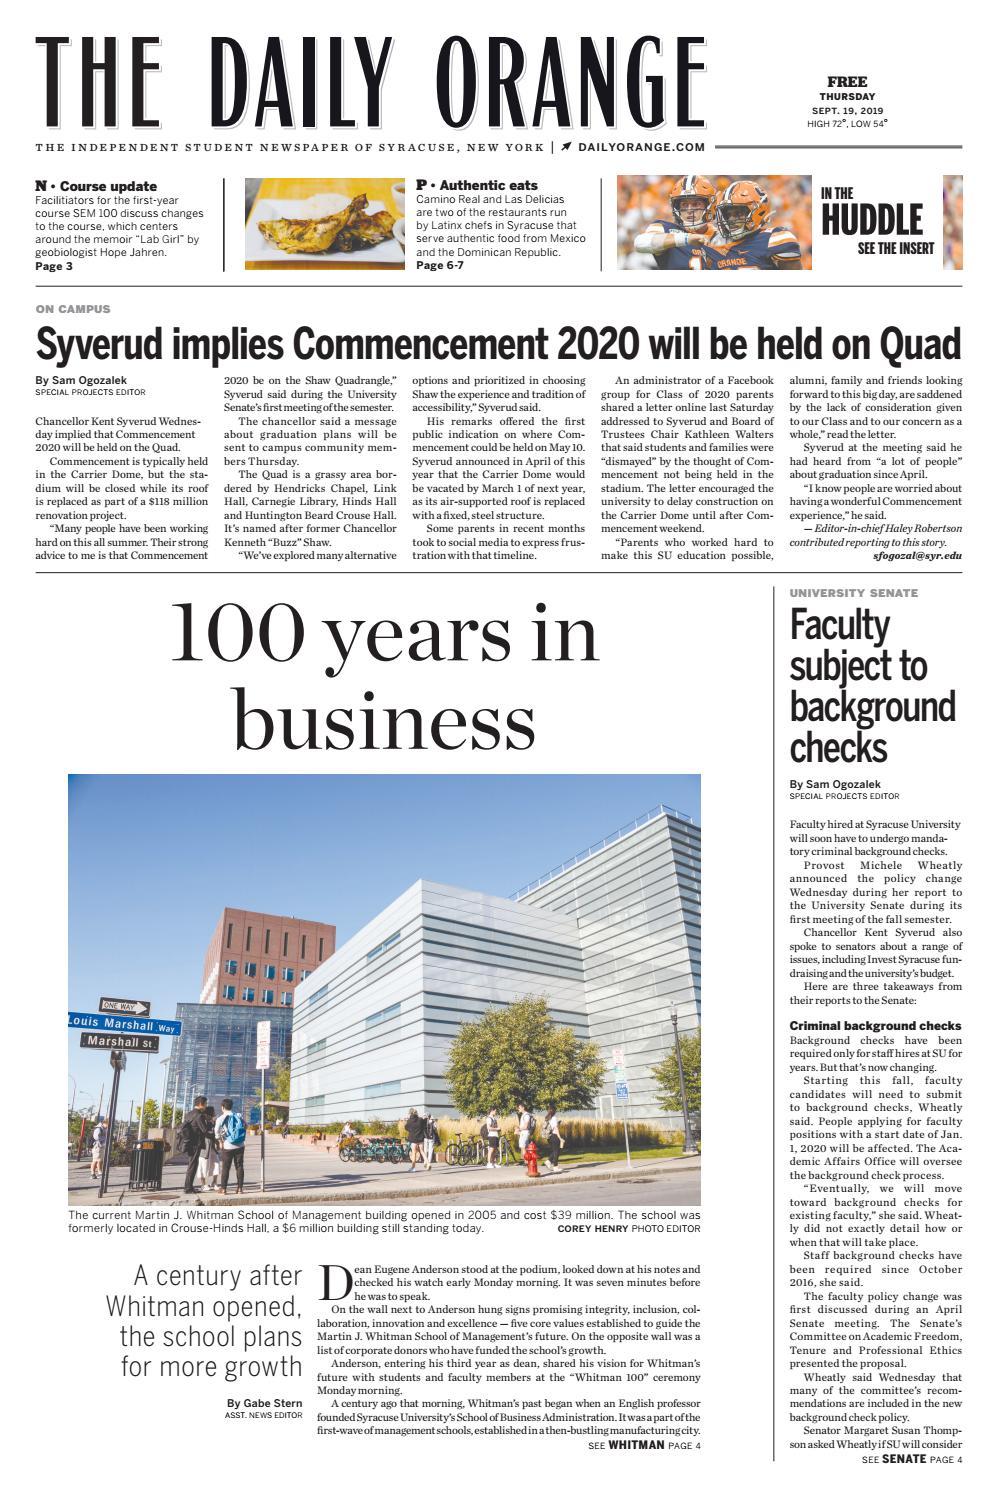 Syracuse Graduation 2020.September 19 2019 By The Daily Orange Issuu